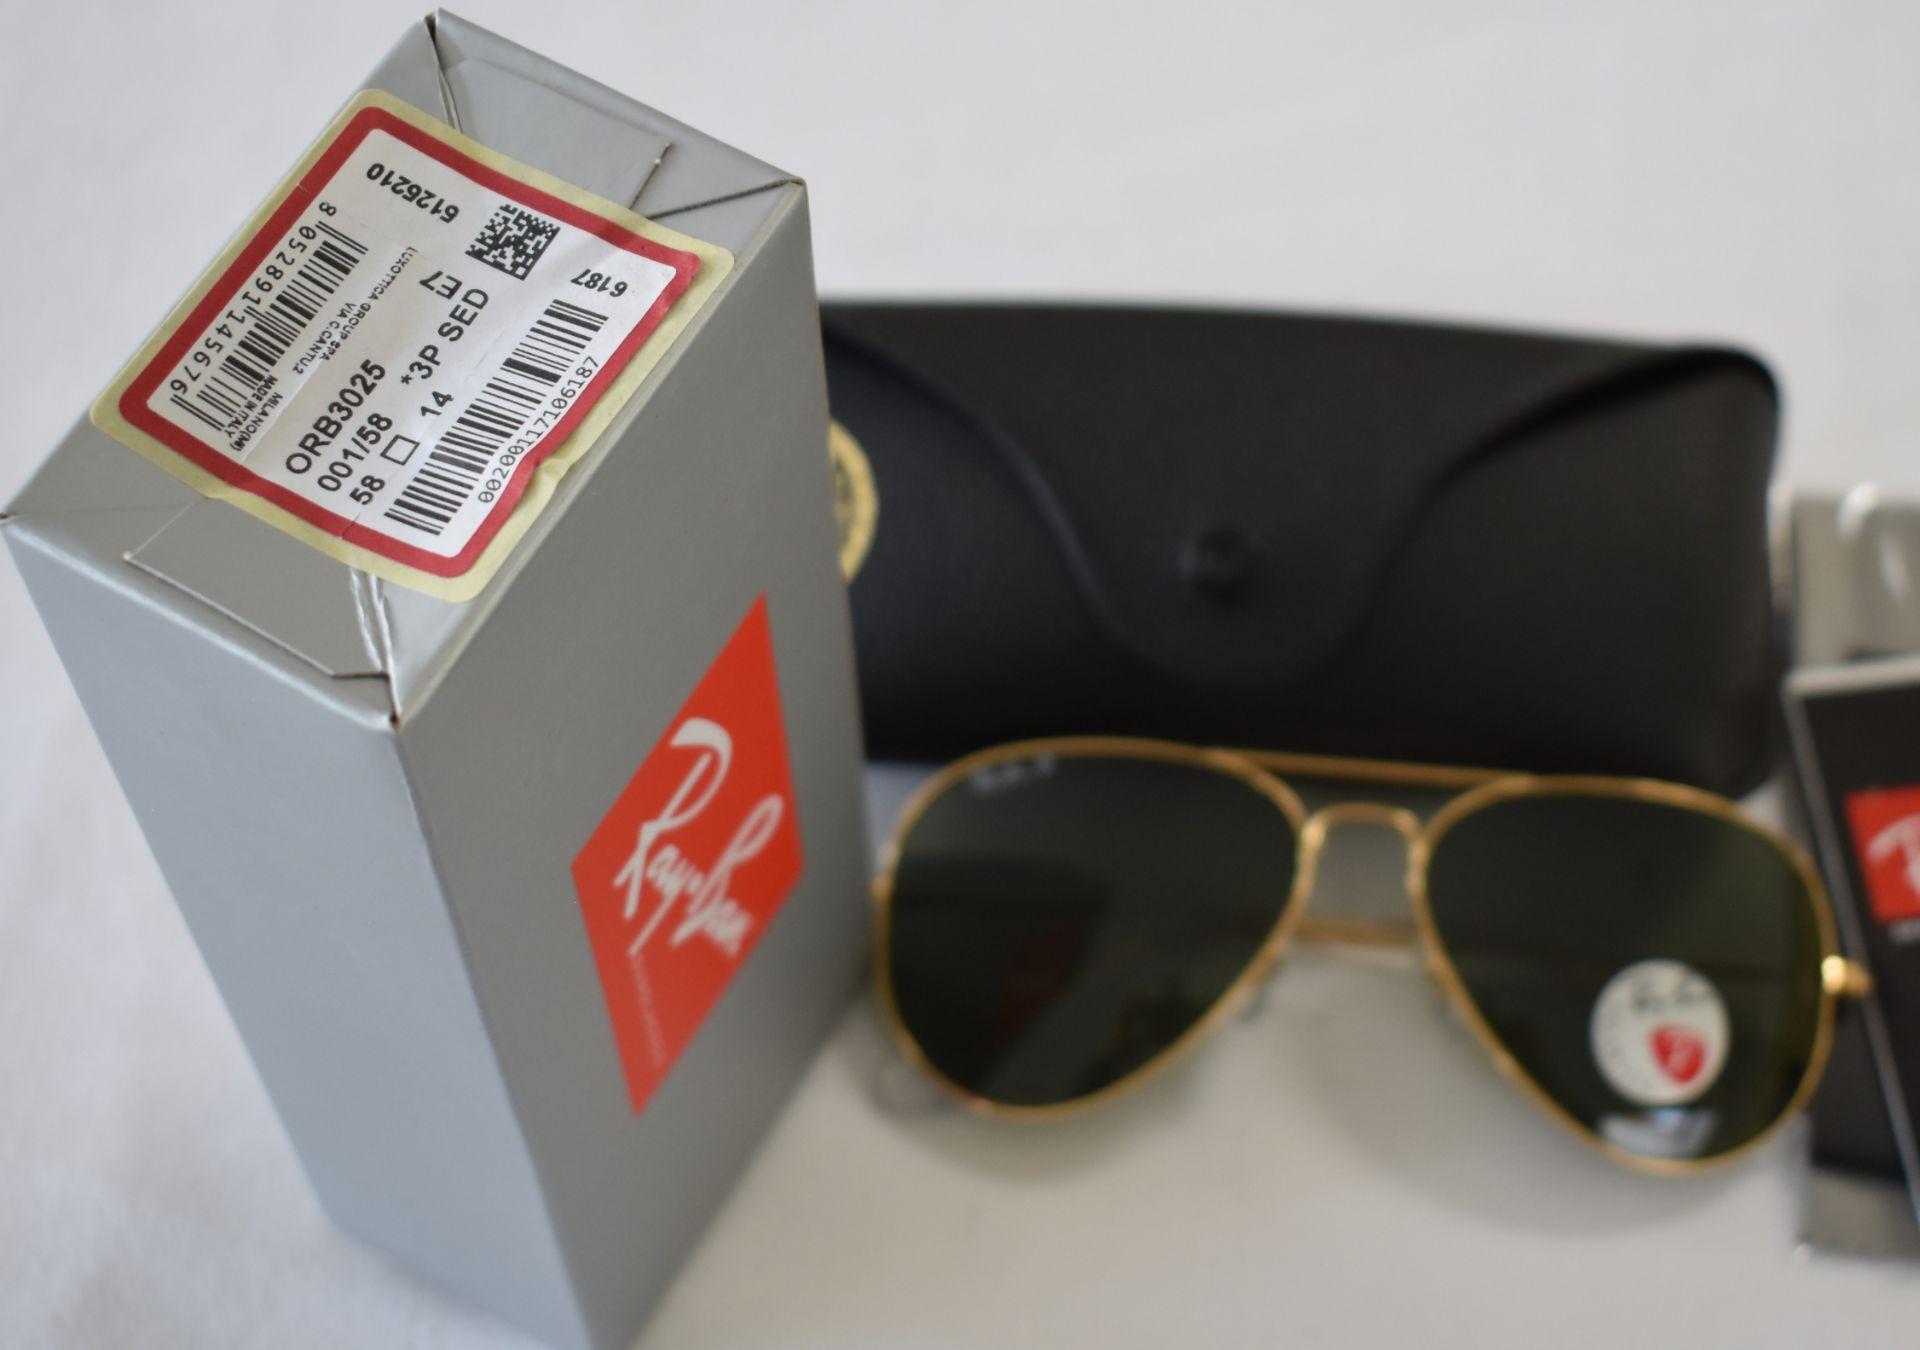 Ray Ban Sunglasses ORB3025 001/58 *3P - Image 2 of 2